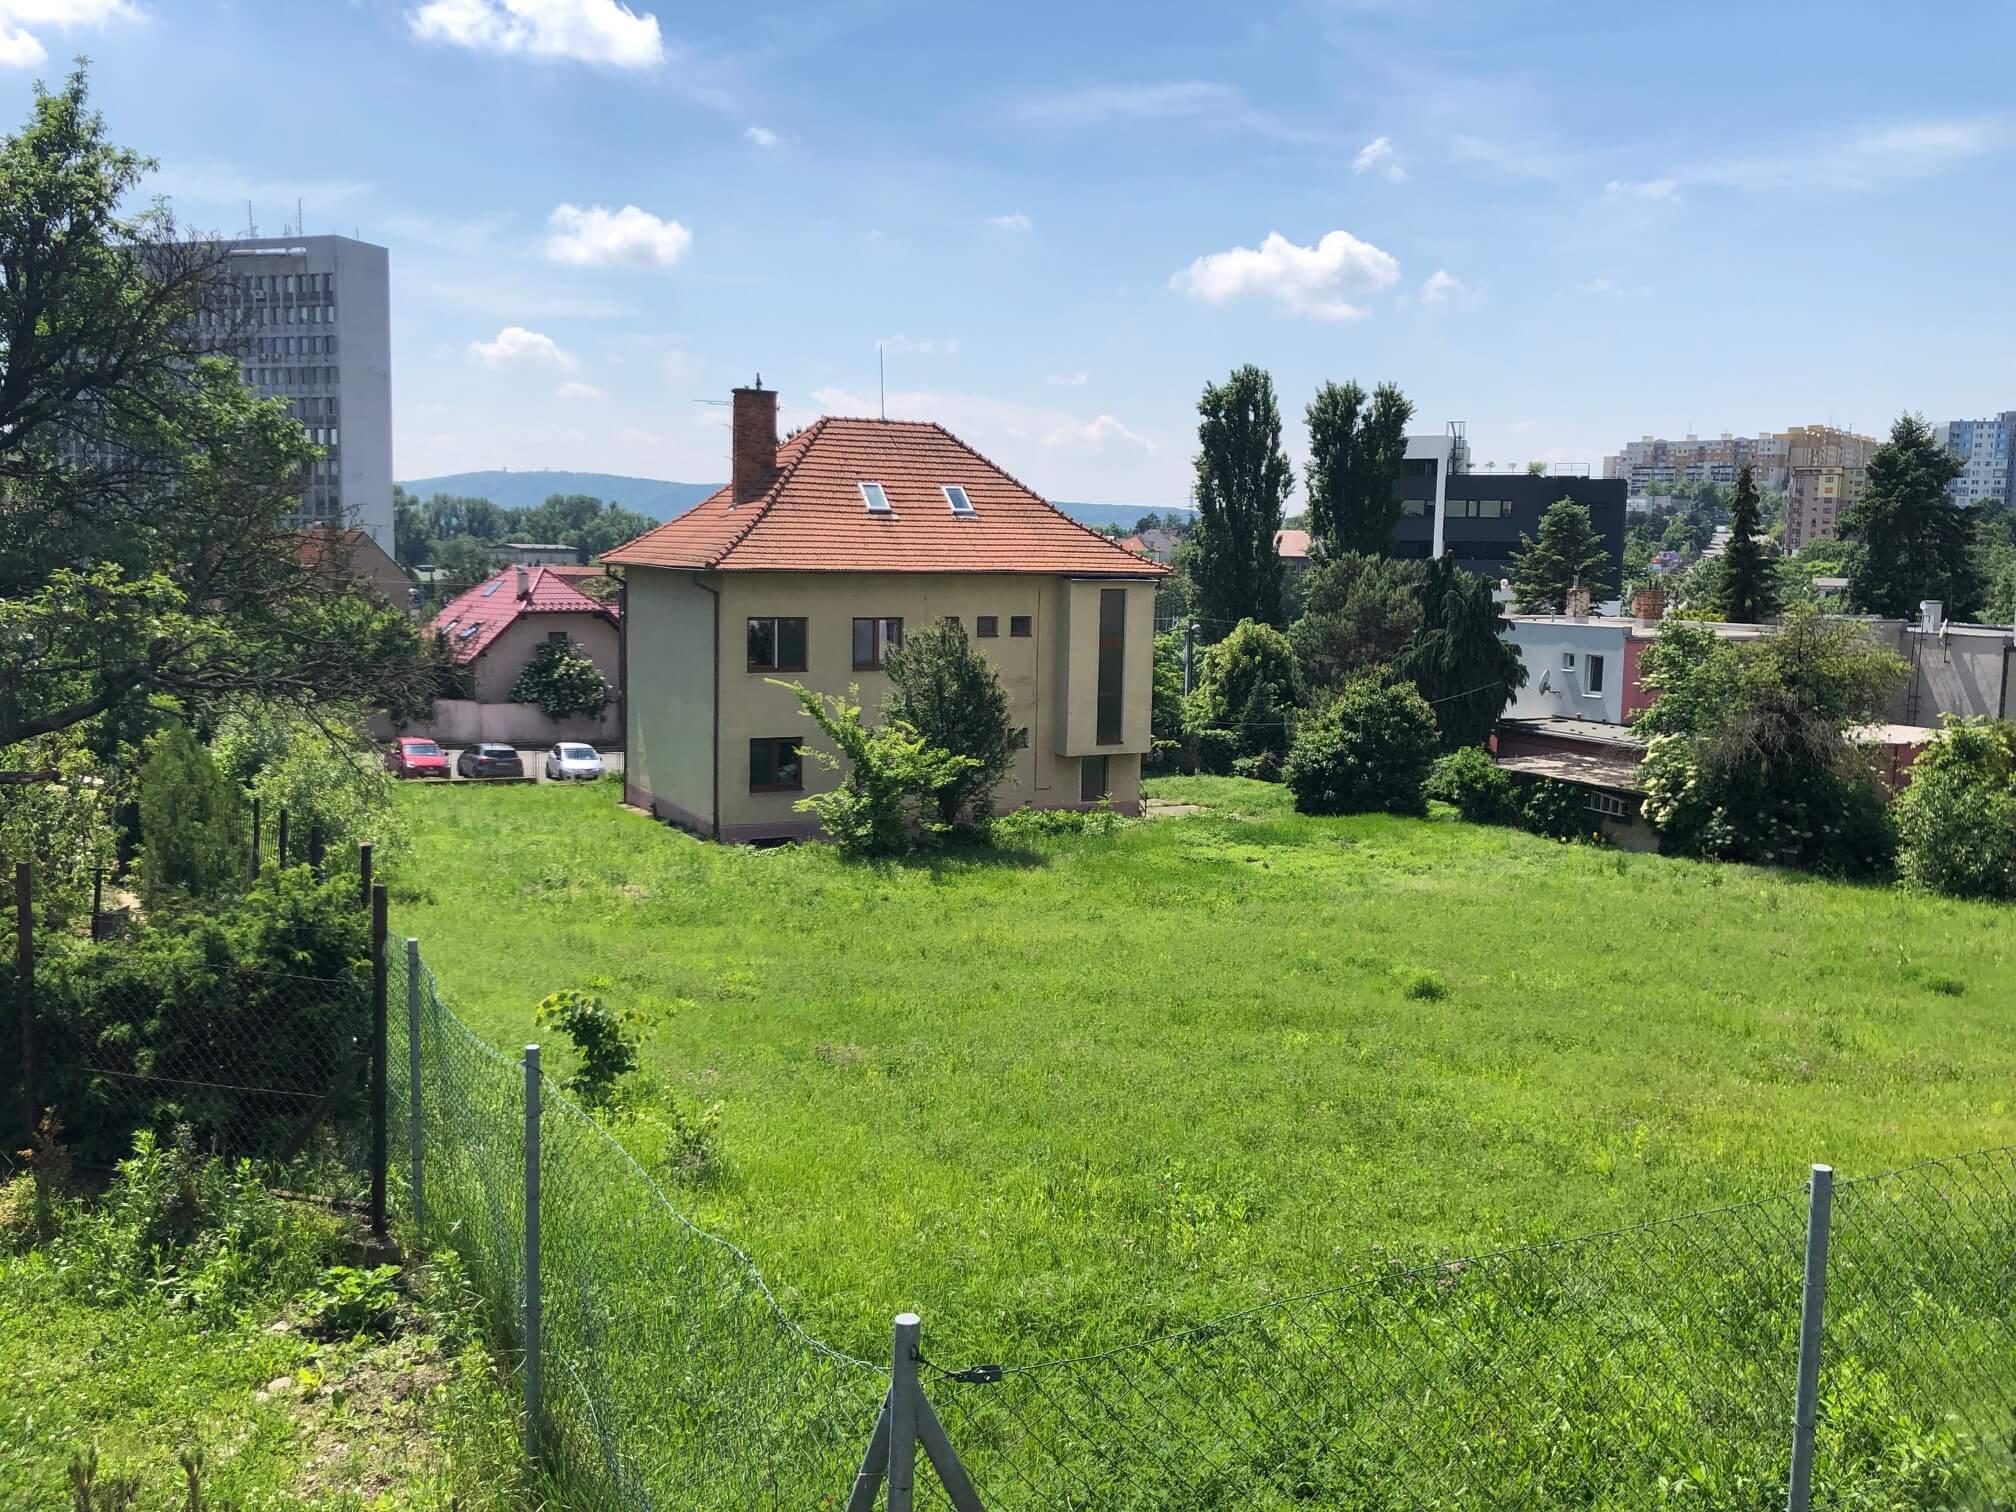 Rezervované: 3 izbový byt, novostavba, 72,25m2, loggia 4,82m2, Staré Grunty, Karlovka, garážové státie-61